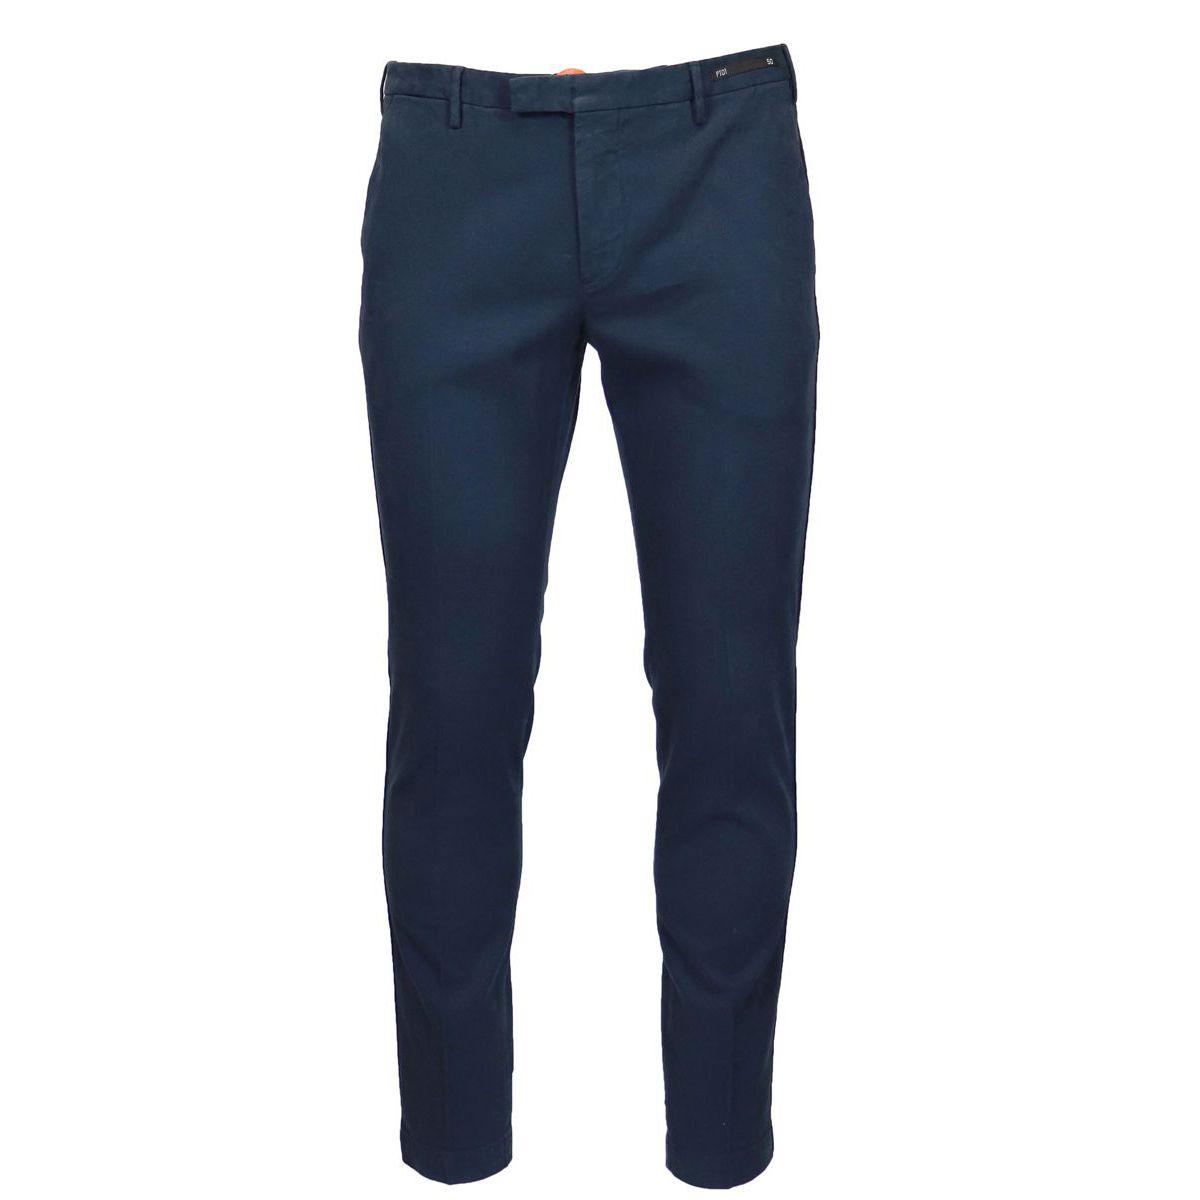 Solid color cotton skinny pants Blue PT01